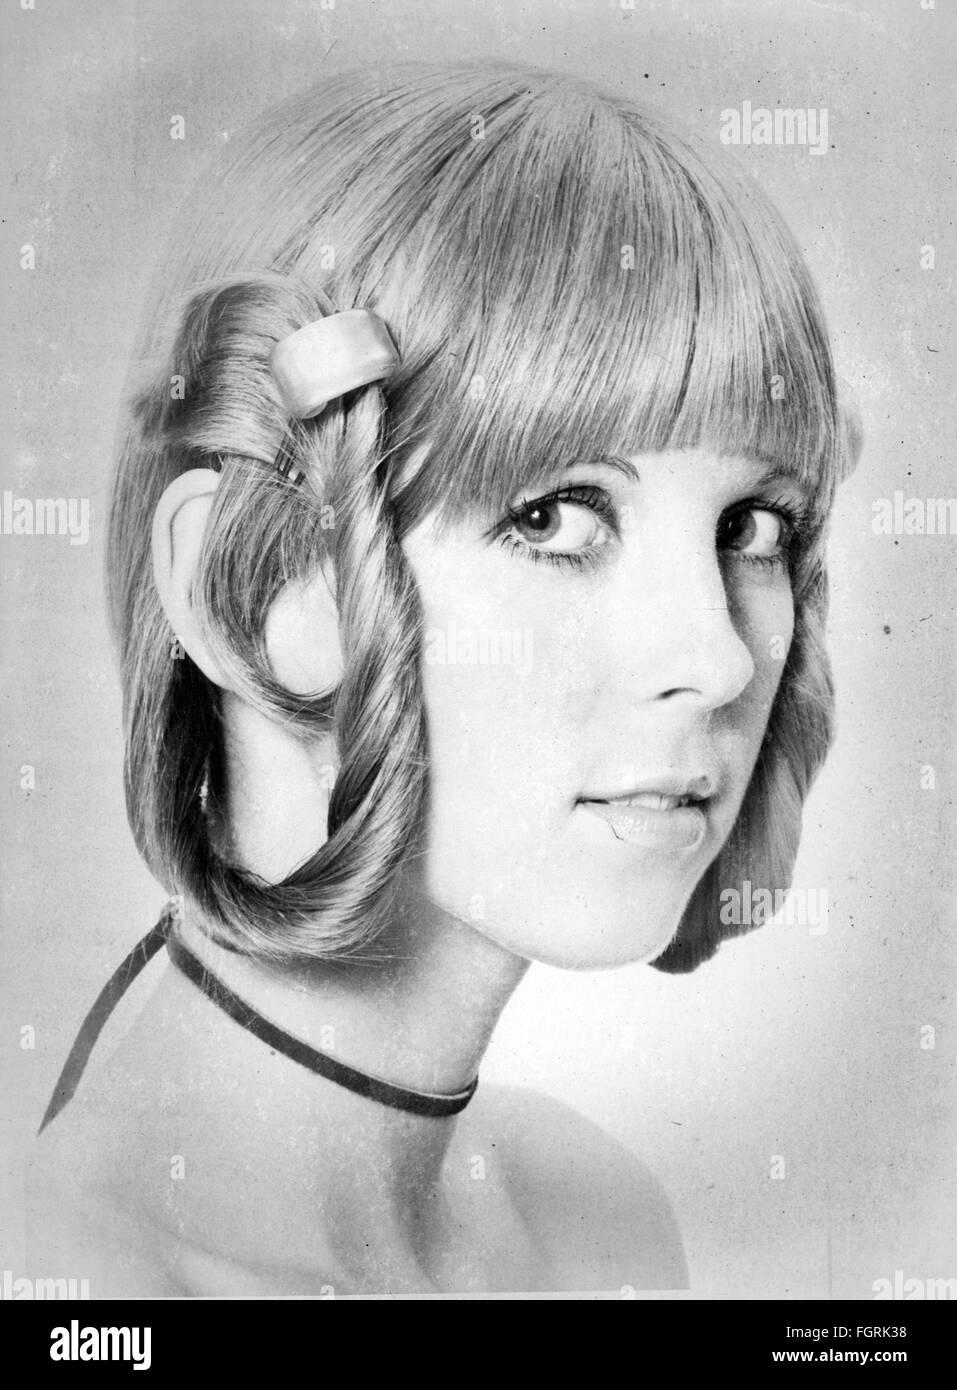 Fashion 1970s Hair Styles Woman S Haircut 1970 Stock Photo Alamy